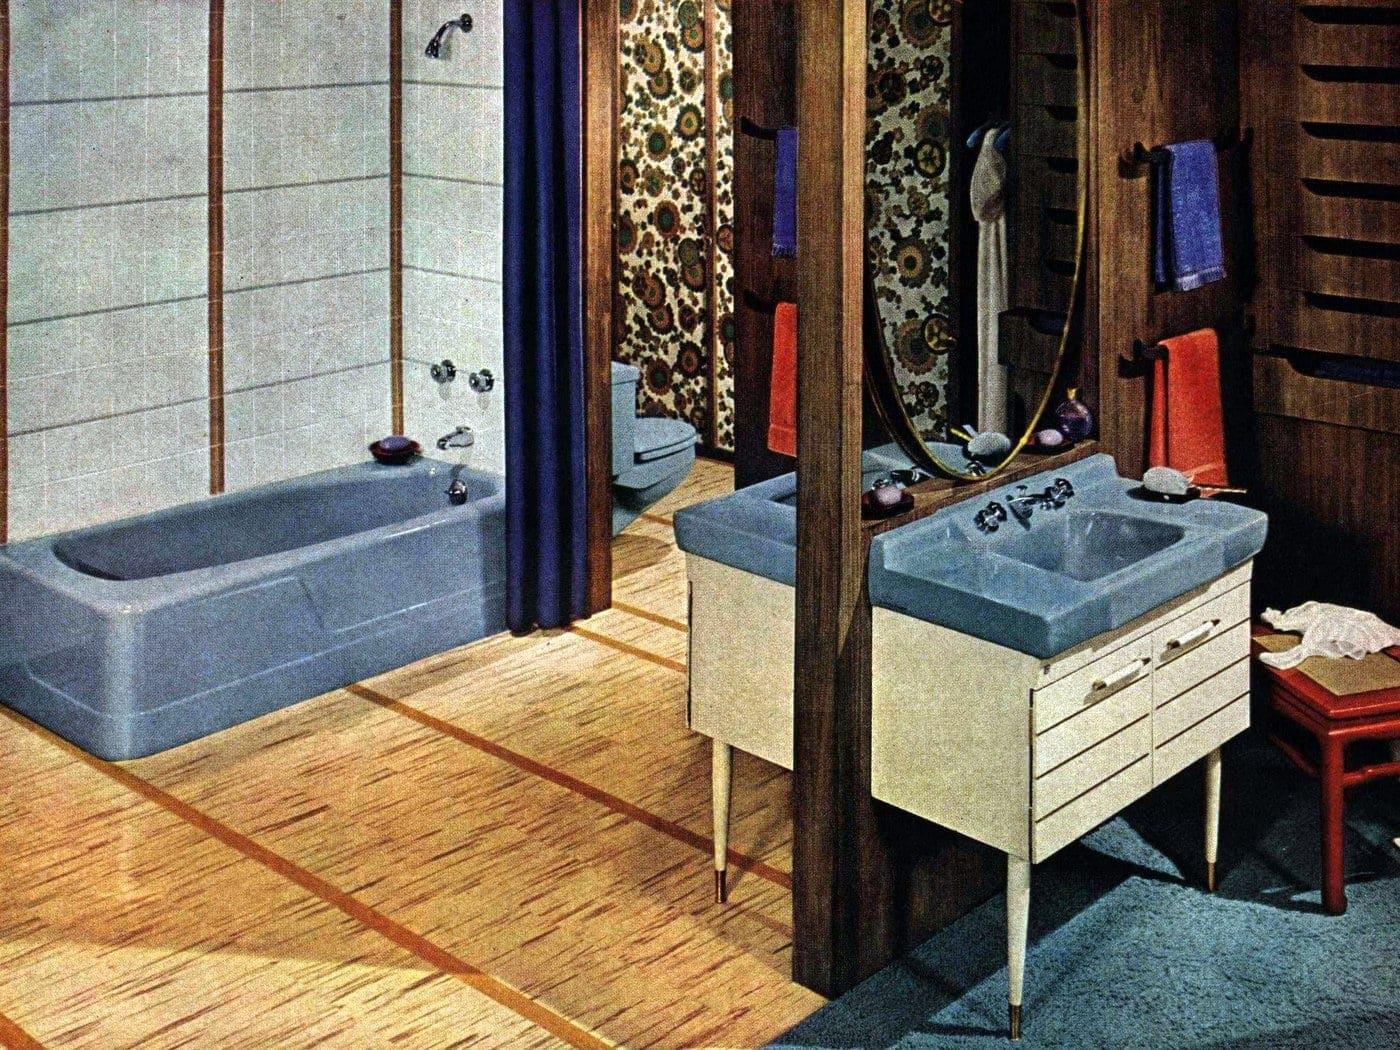 Vintage bathroom decor from 1962 (2)